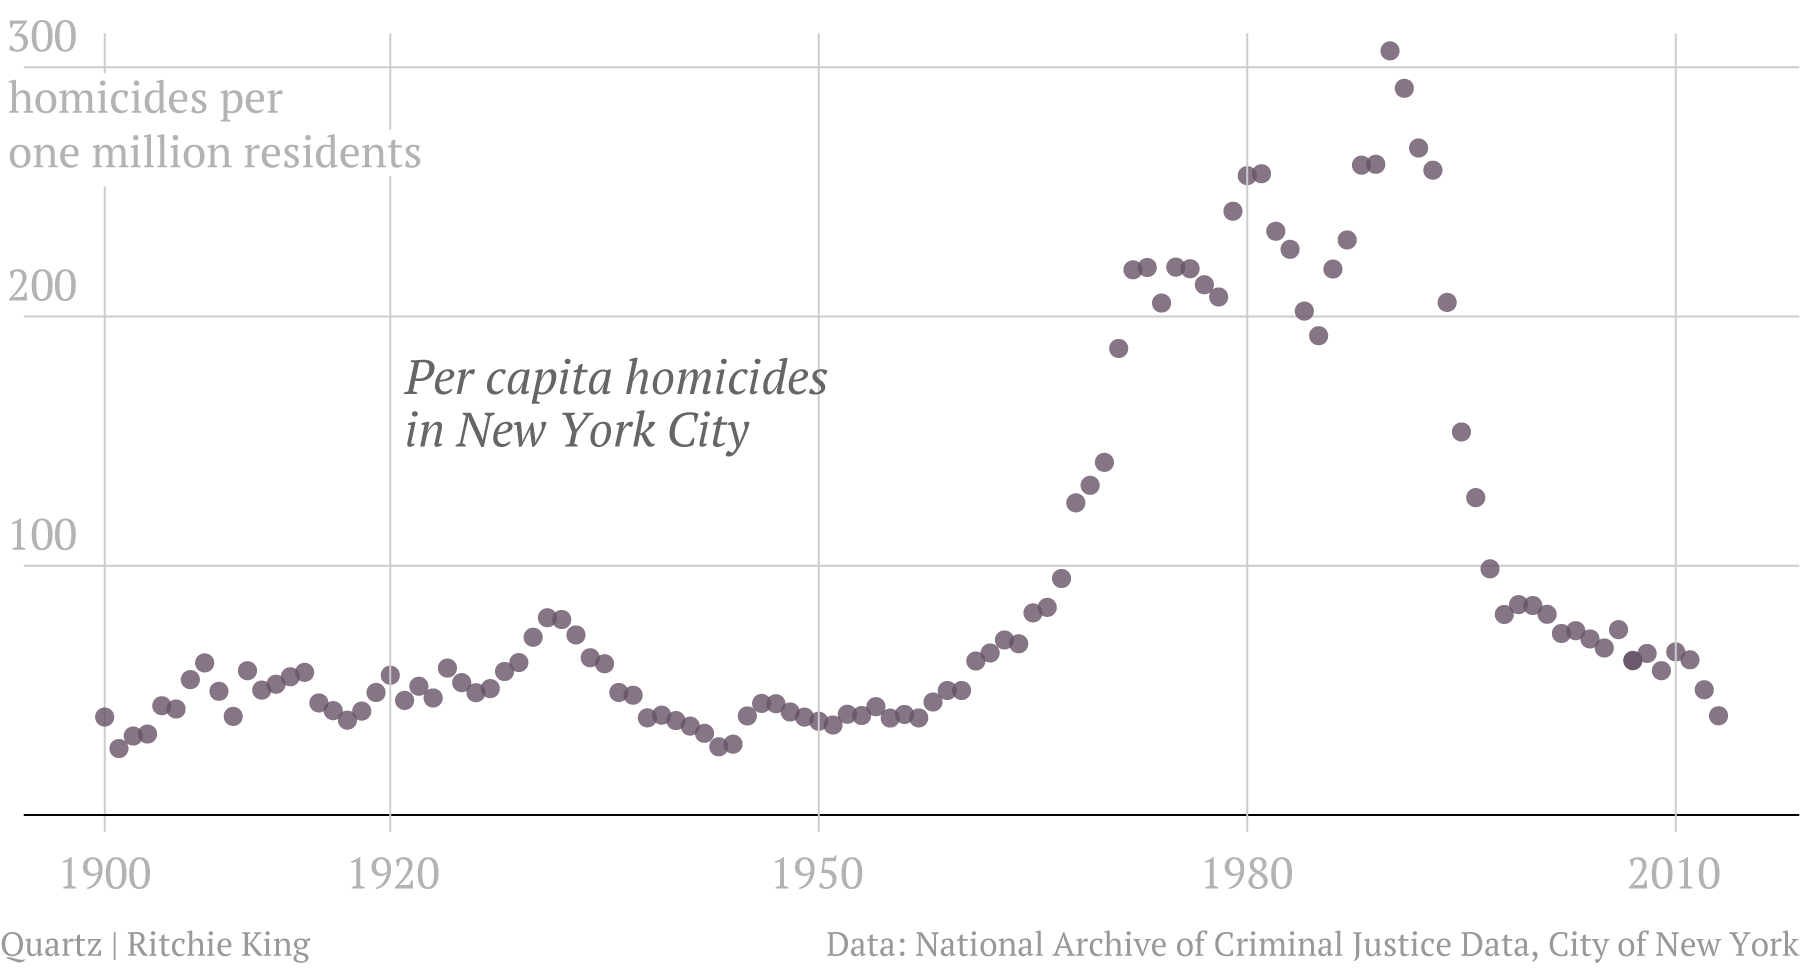 New York City Homicide Rate Per